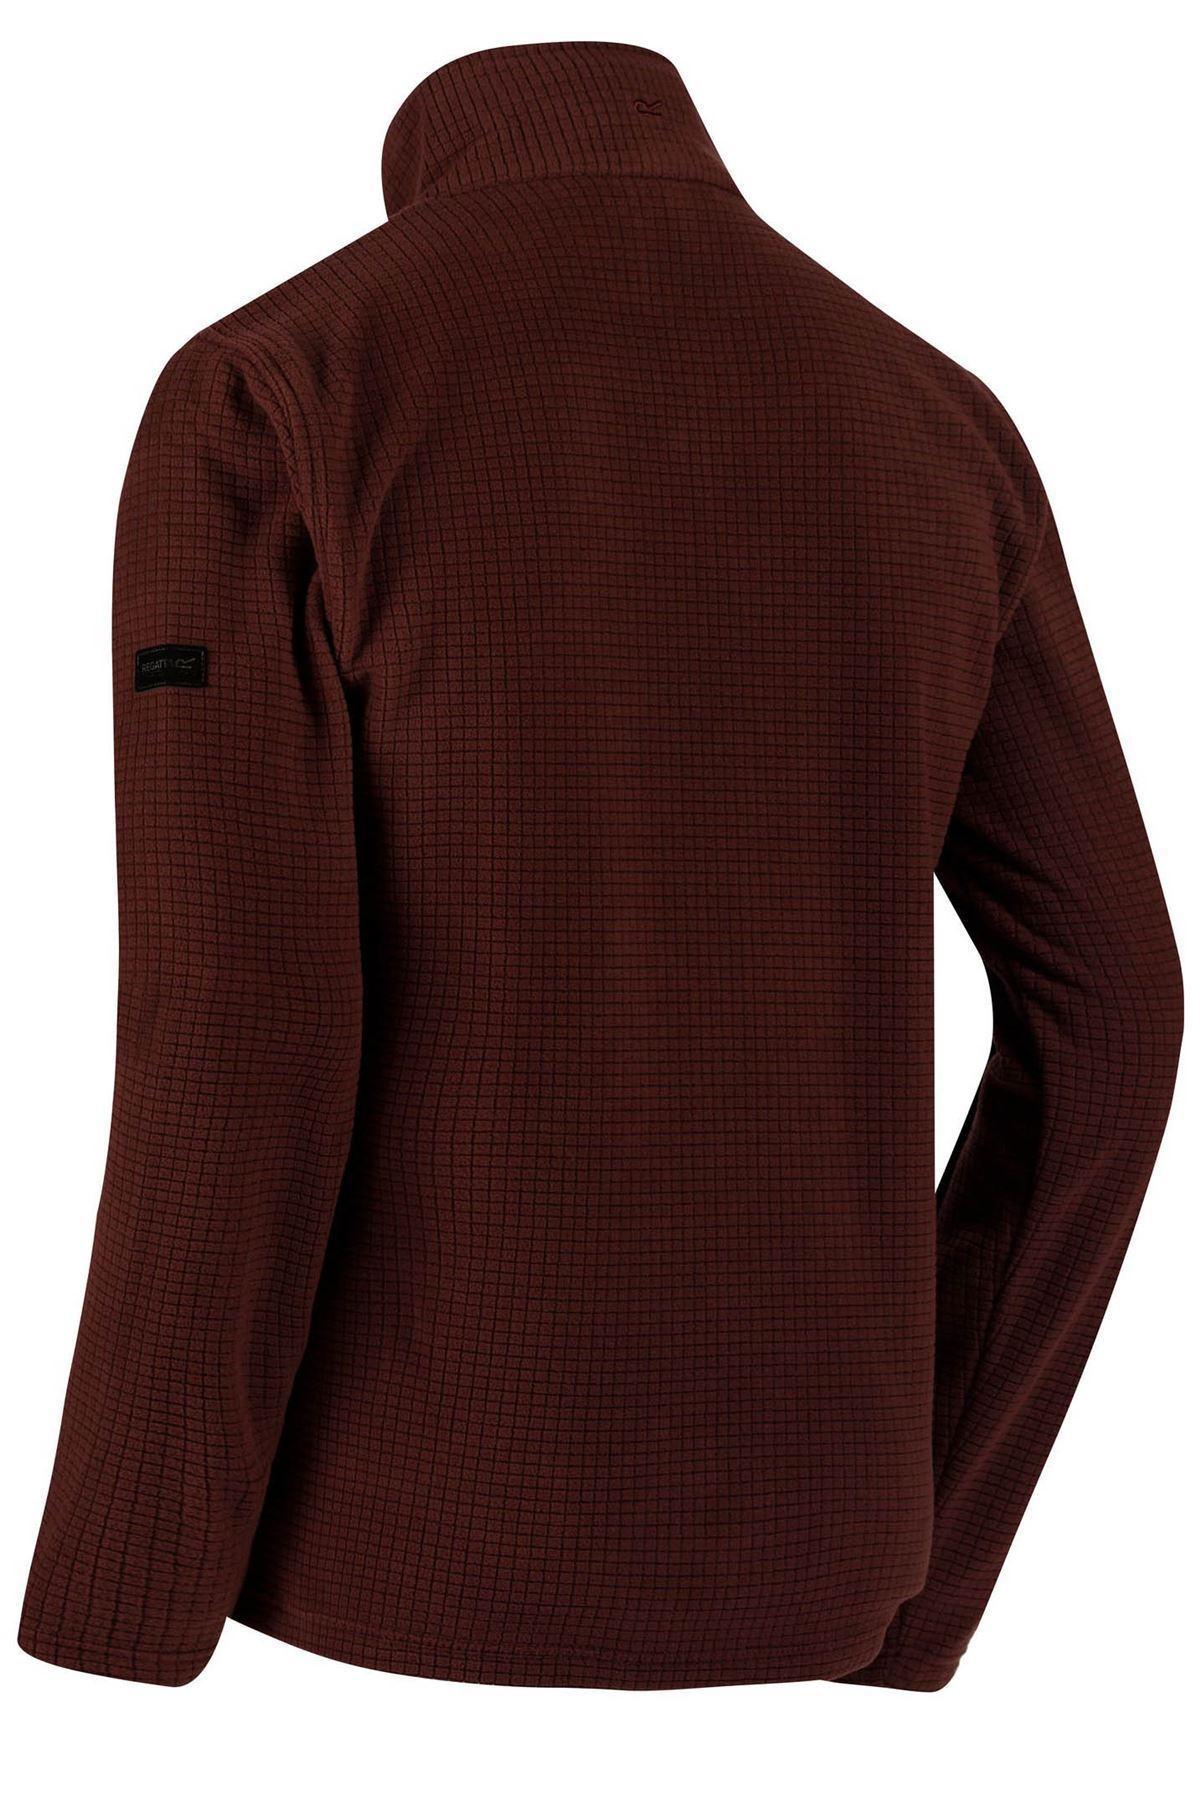 REGATTA-Mens-Half-Zip-Neck-Grid-Textured-Fleece-RRP-30 thumbnail 18